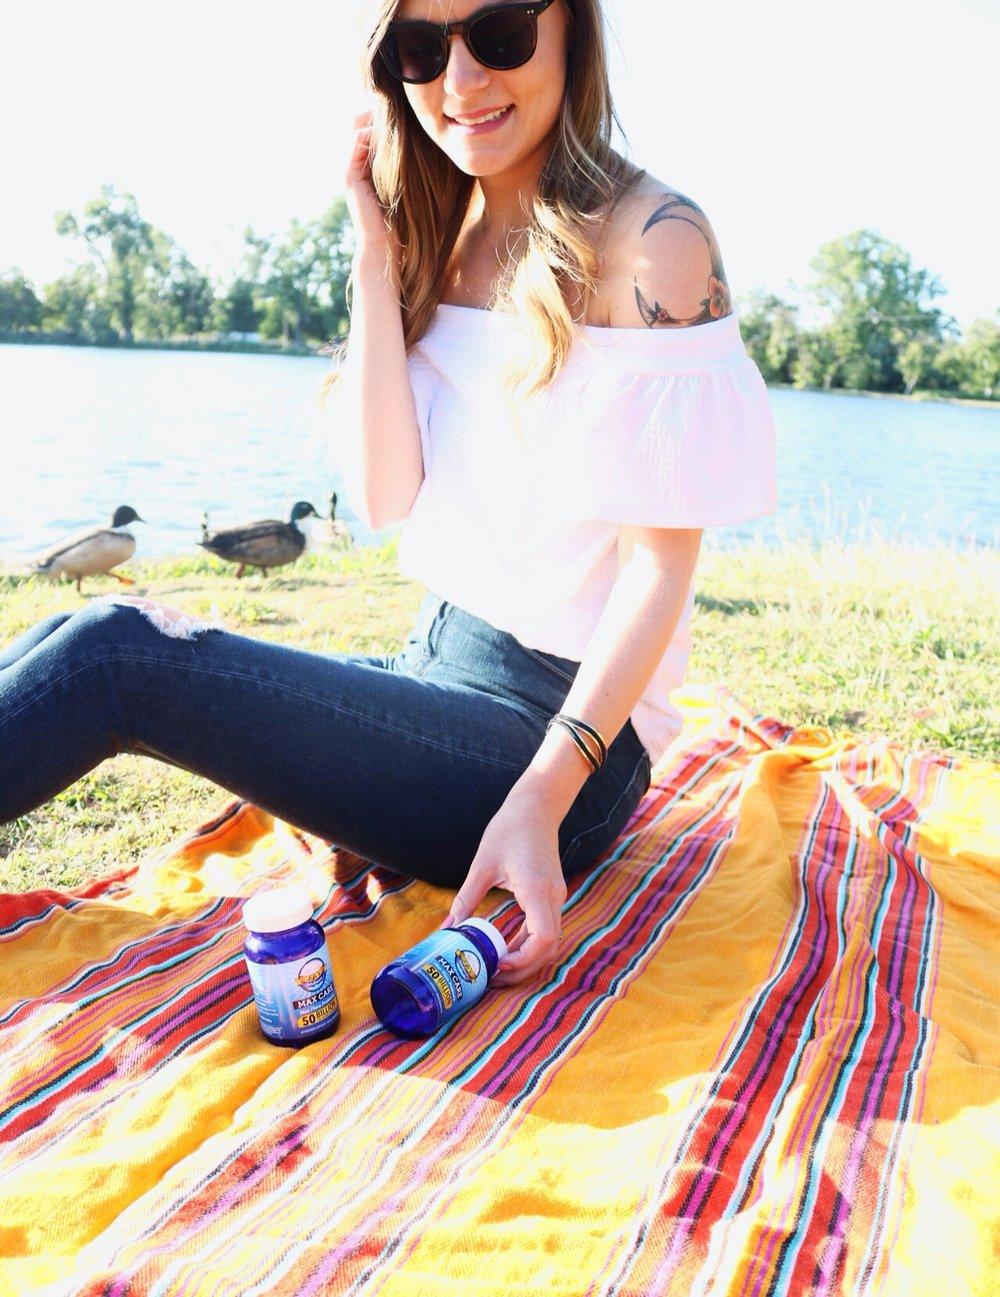 Life's Wellness // Probiotics // Woven Picnic Blanket // Maria Shireen Bracelet